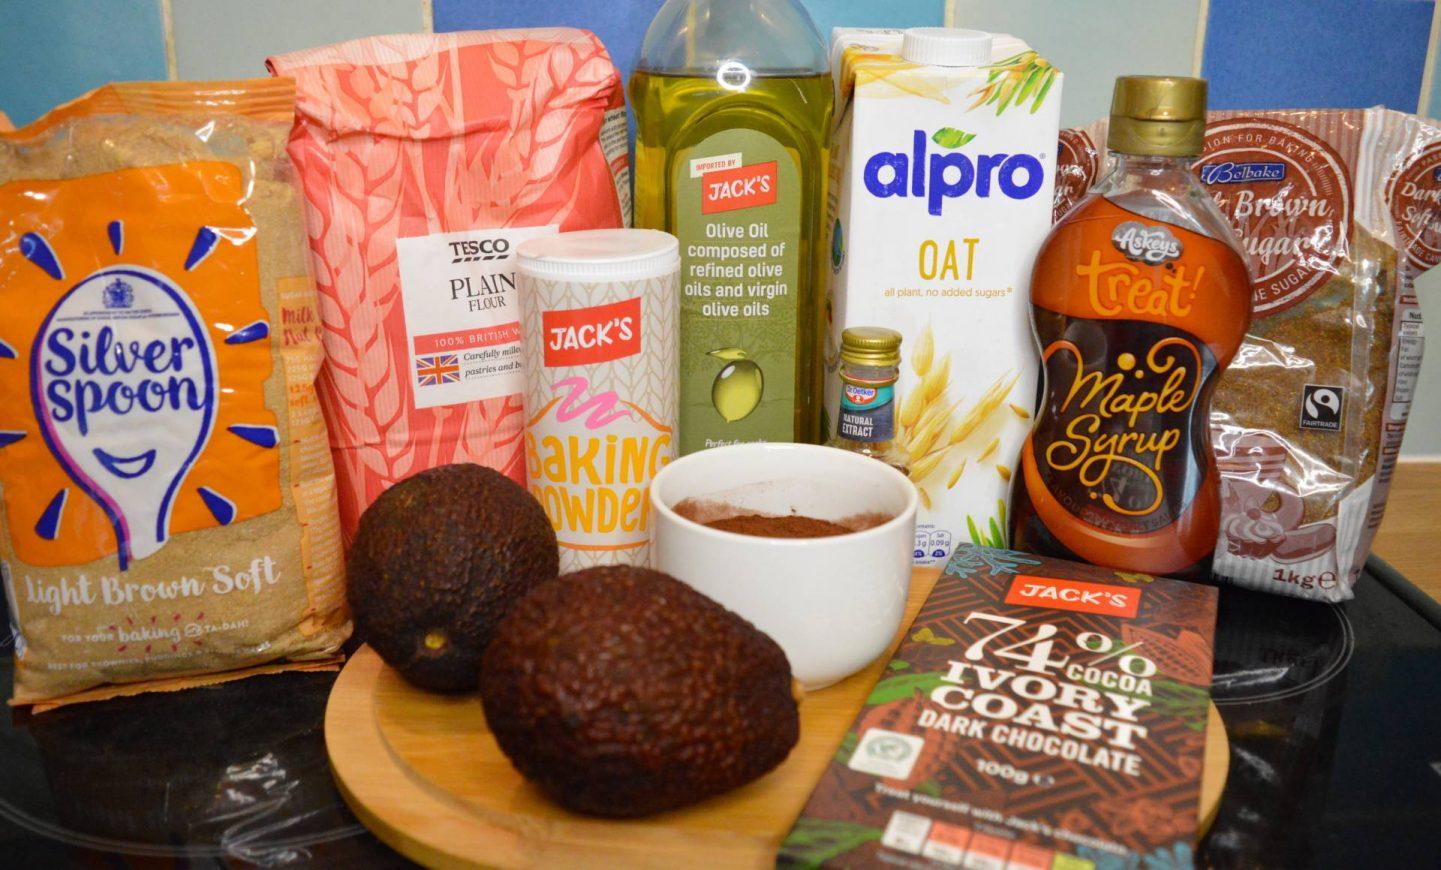 Hearty Vegan Comfort Food For Autumn, ingredients for vegan avocado brownies from Jack's supermarket